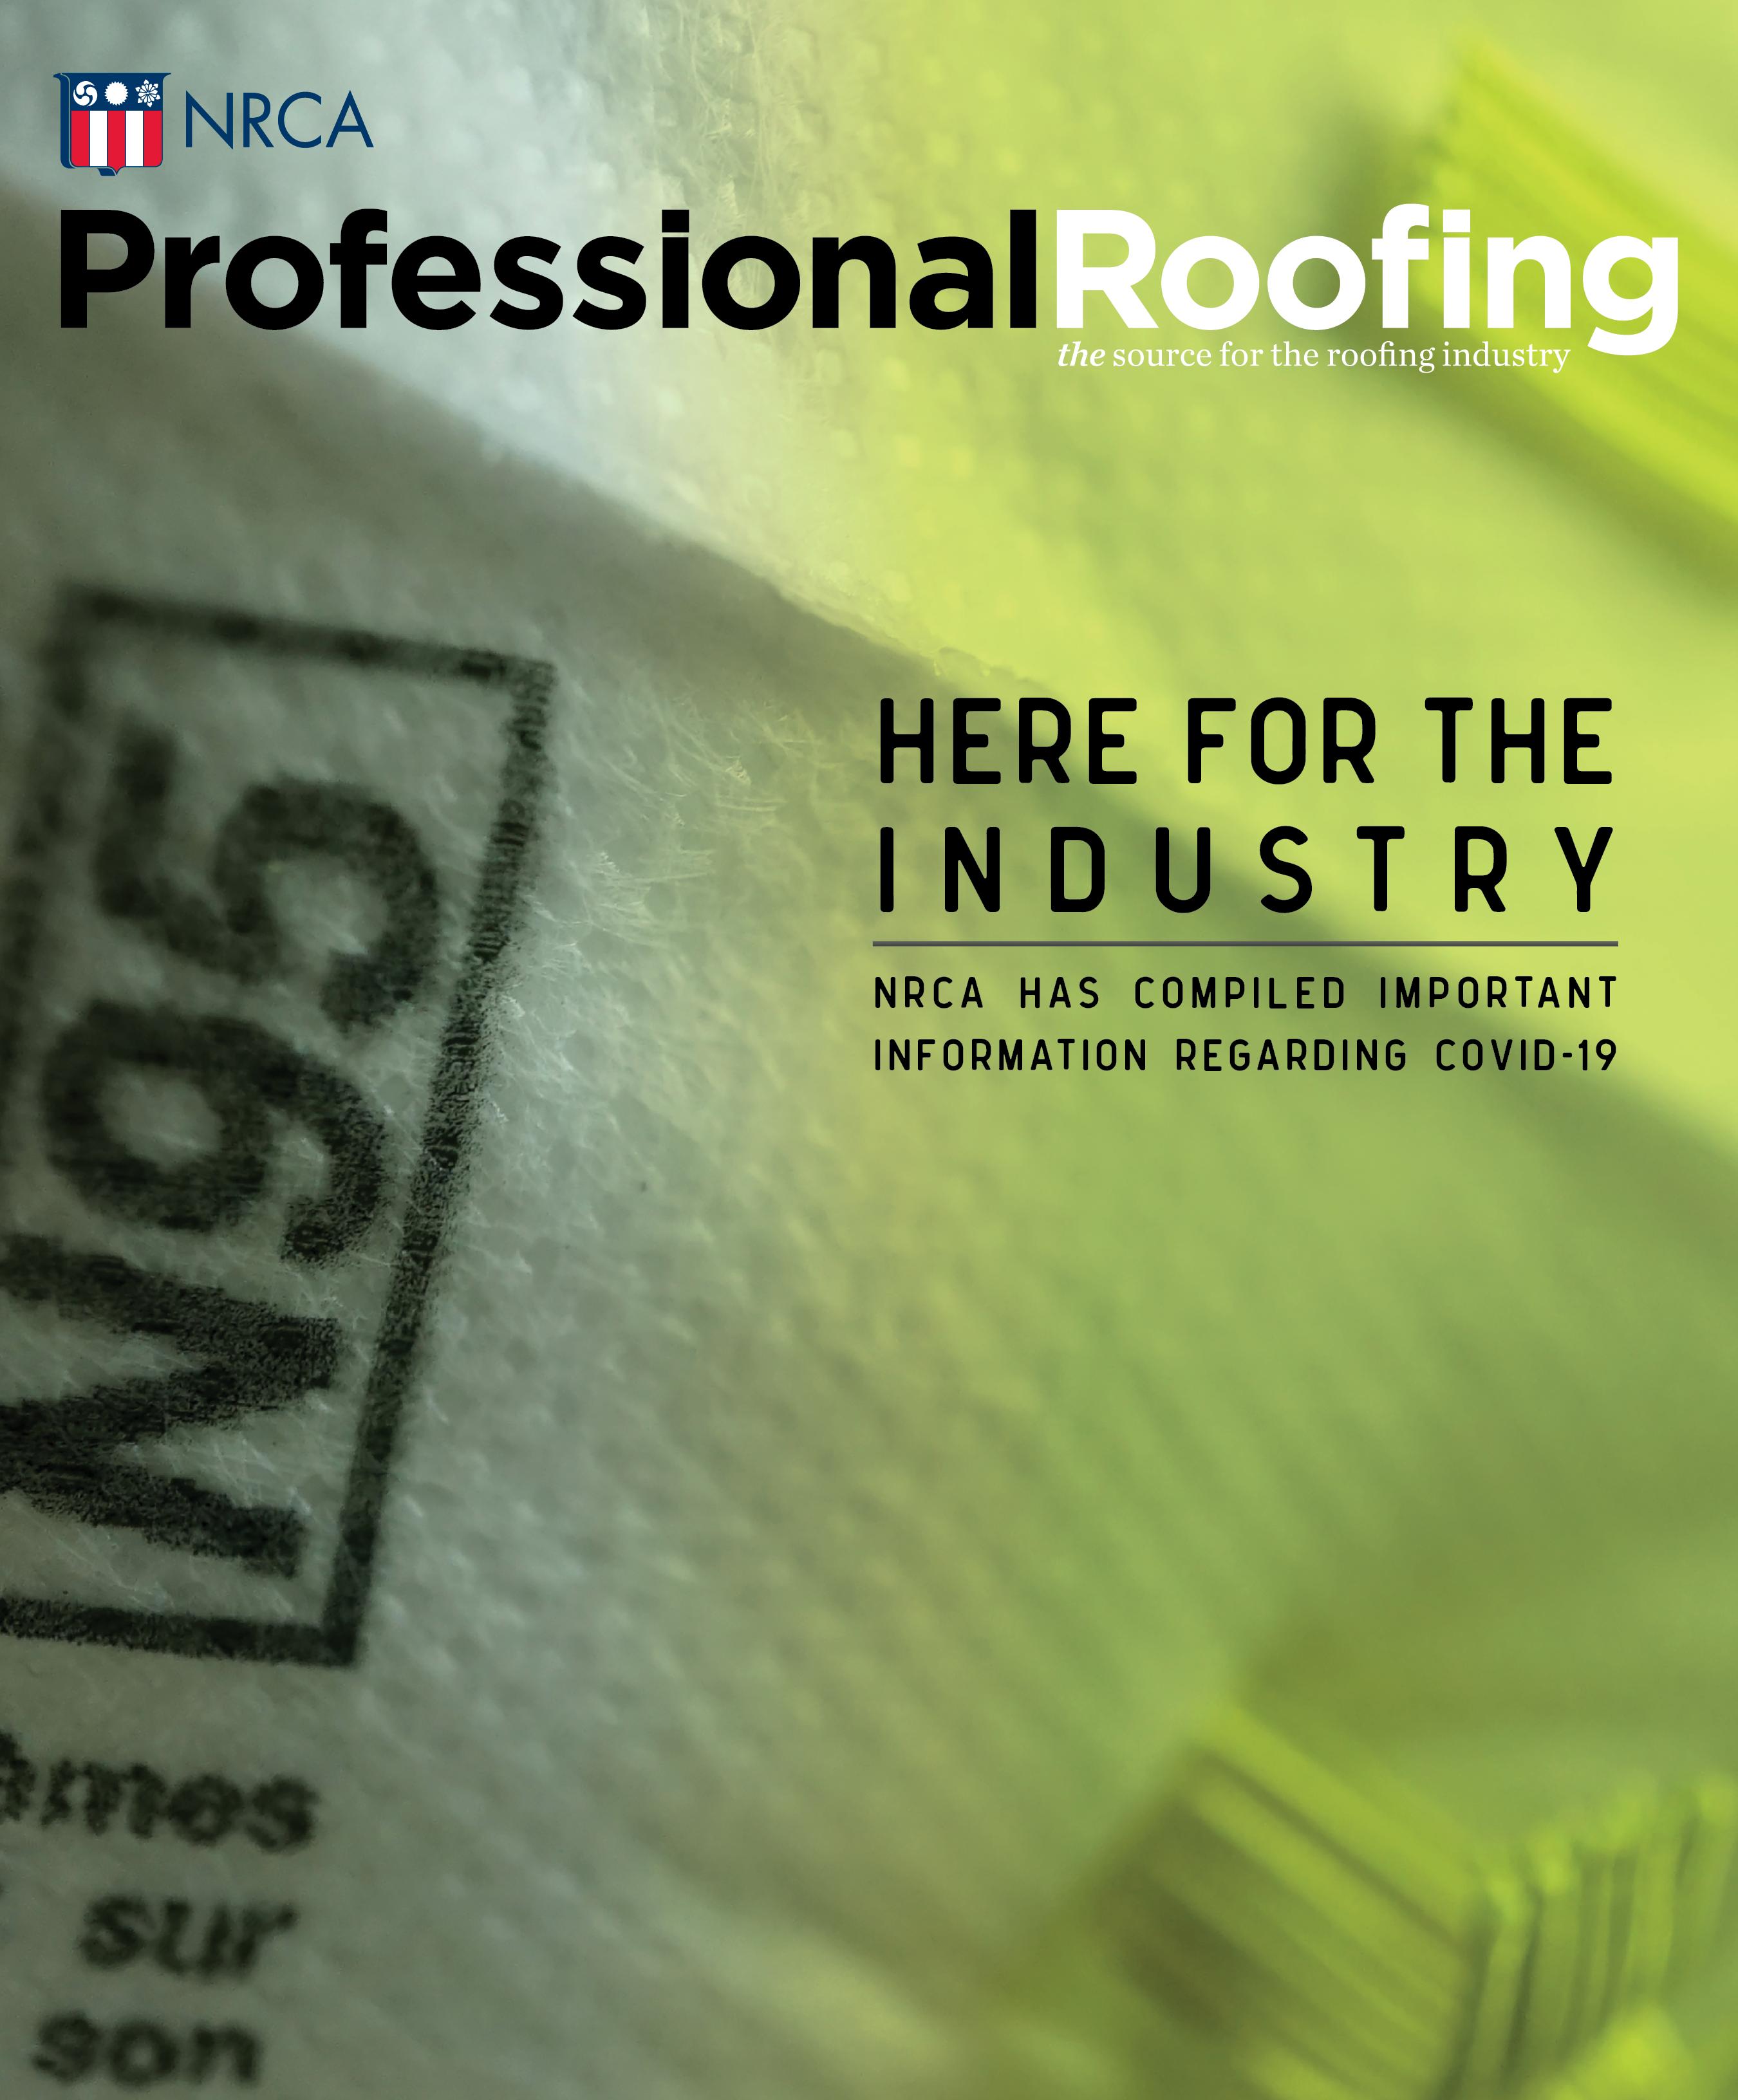 Professional Roofing Magazine 5/1/2020